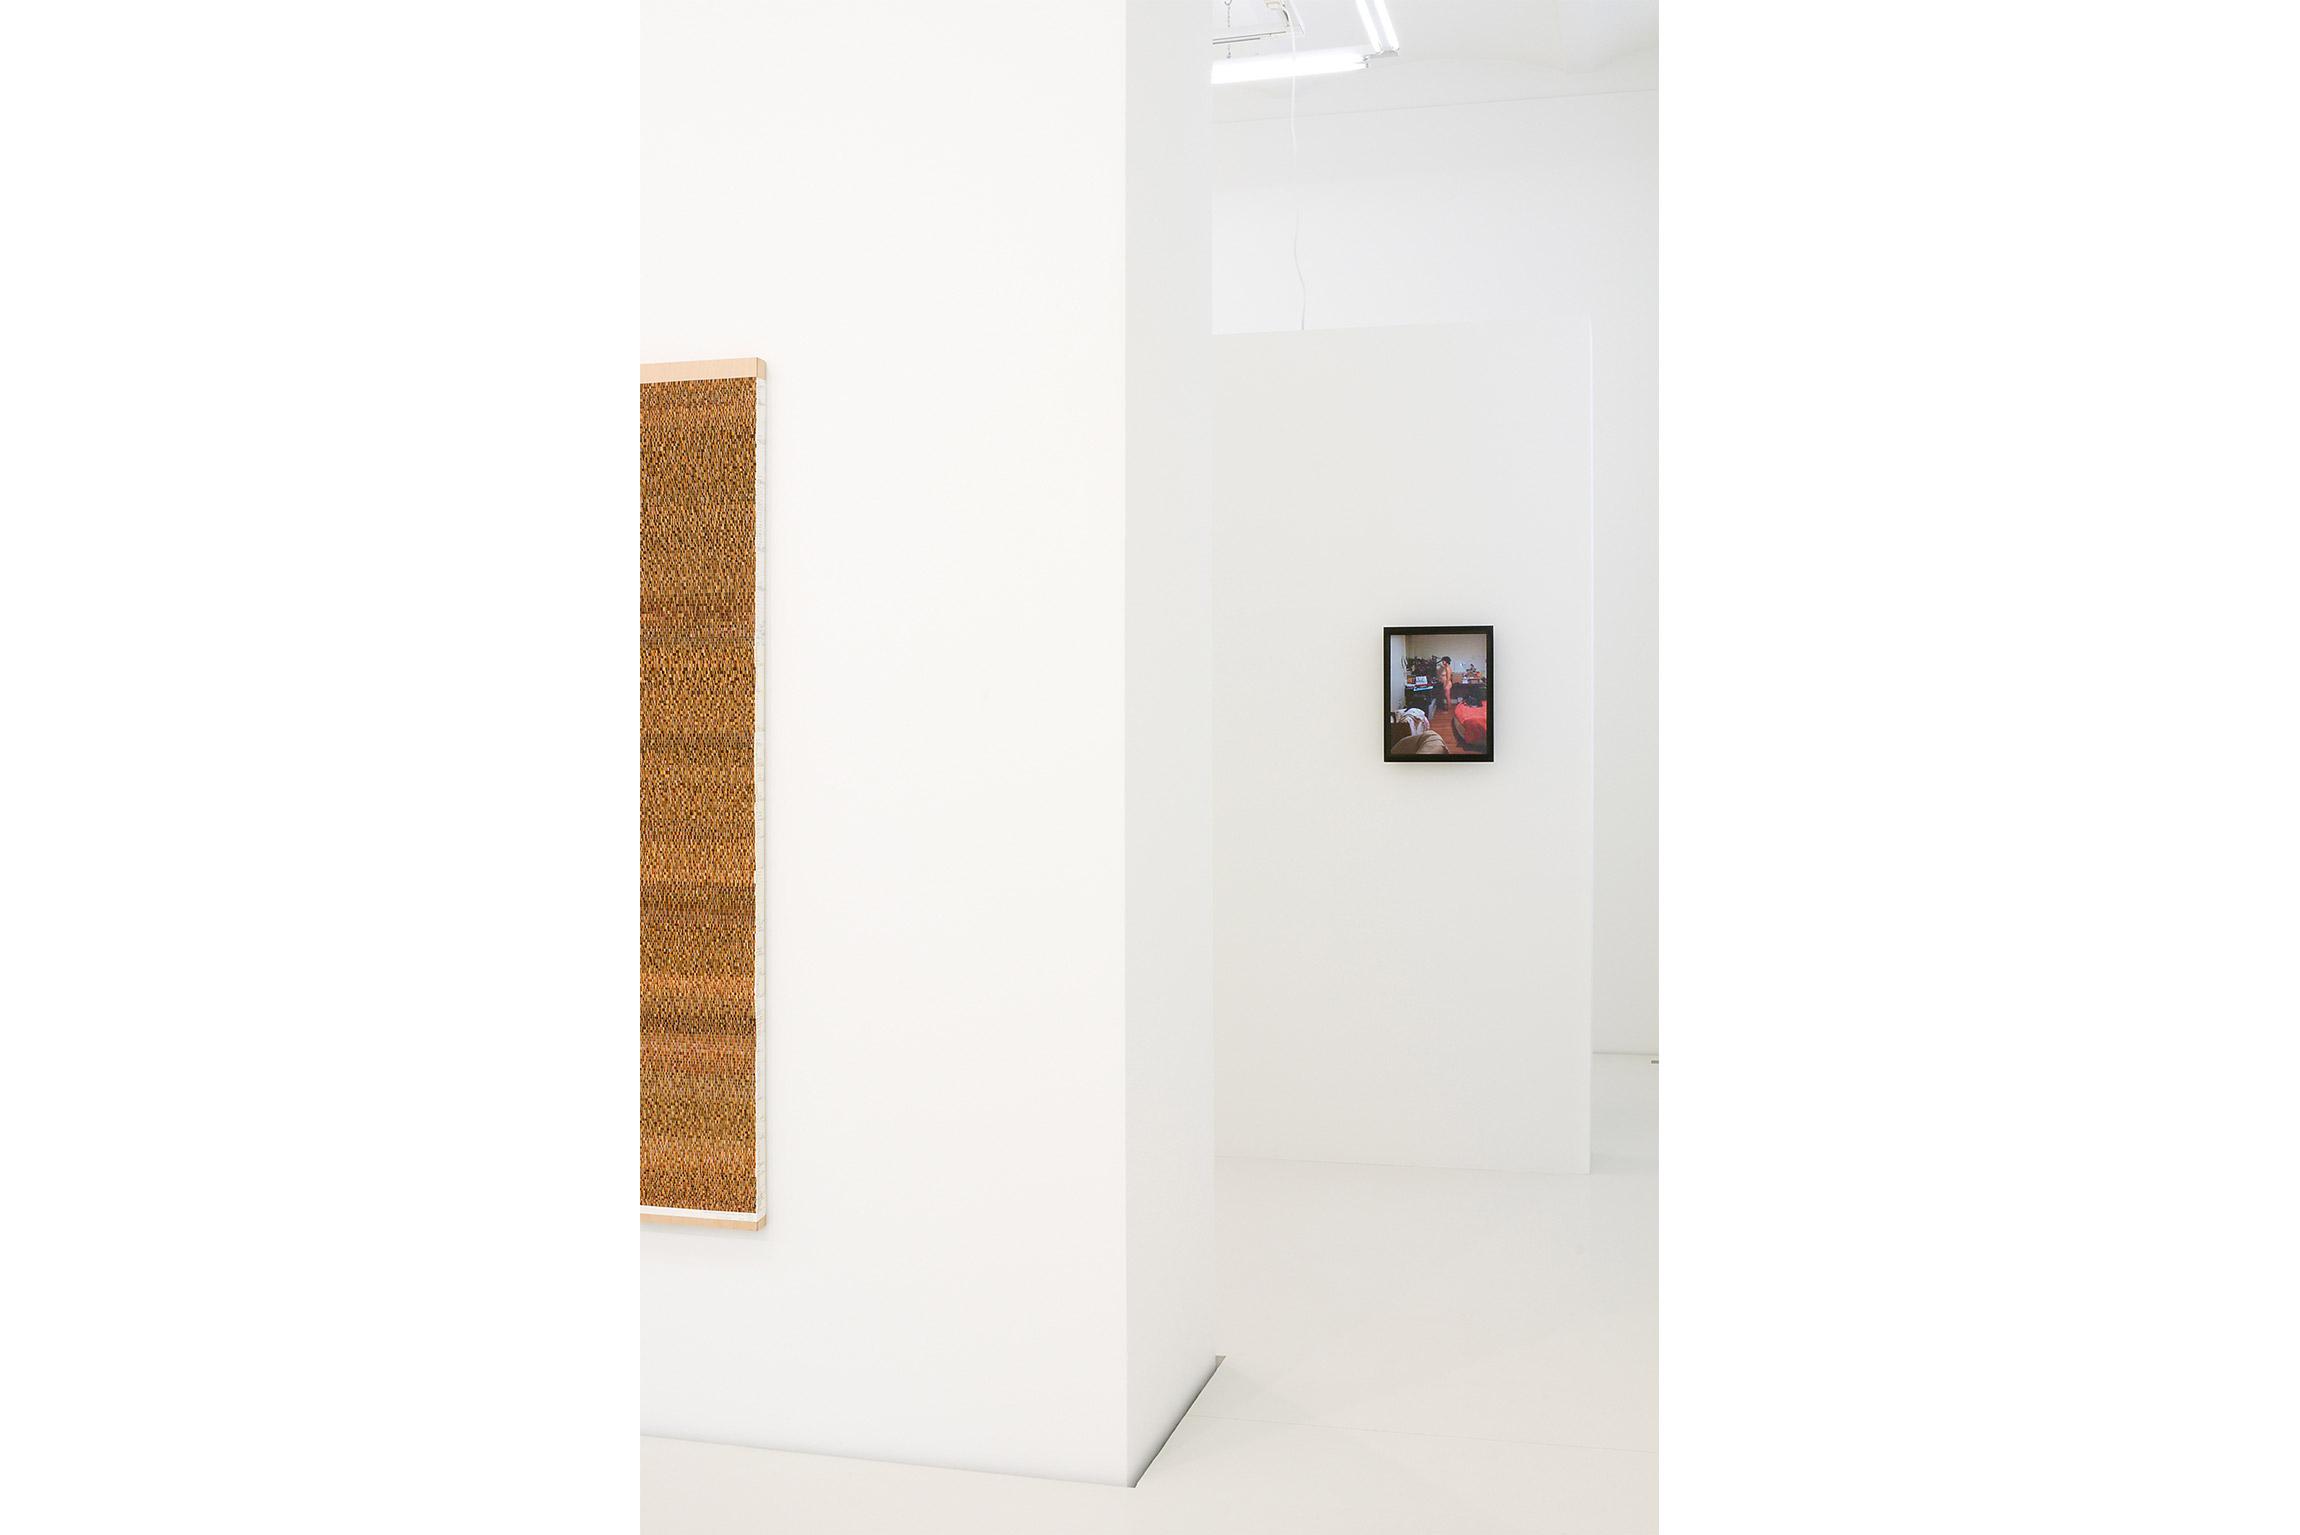 Danica Phelps Galerie Judin